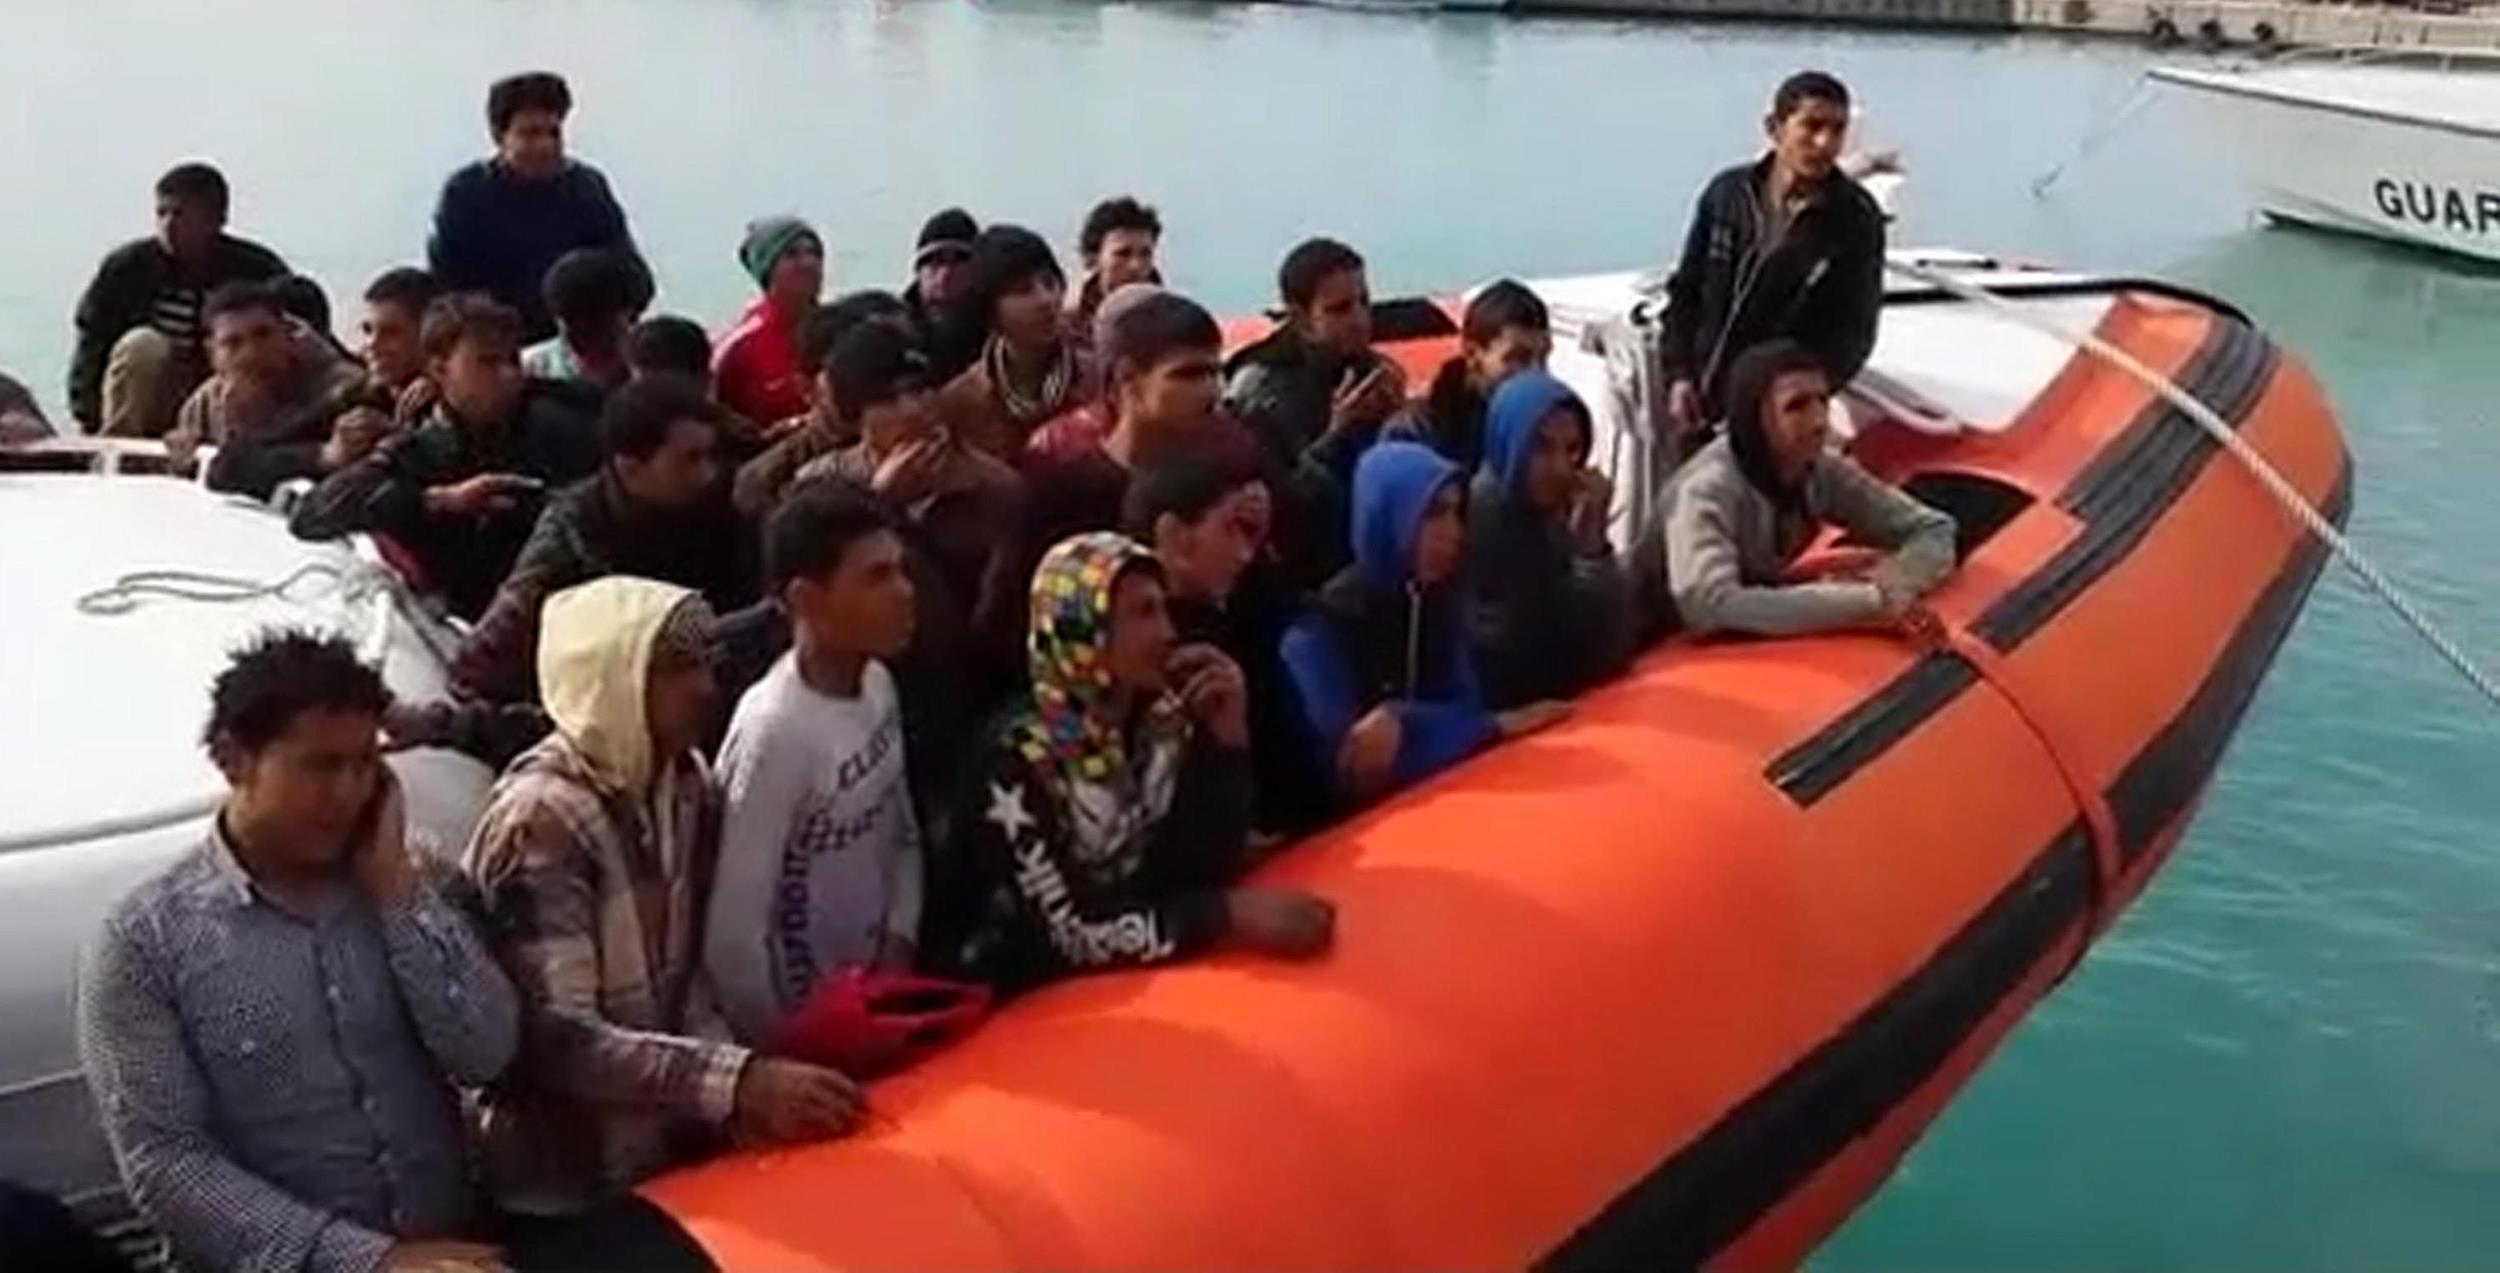 Image: Migrants rescued in the Strait of Sicily arrive in the port of Pozzallo, Sicily